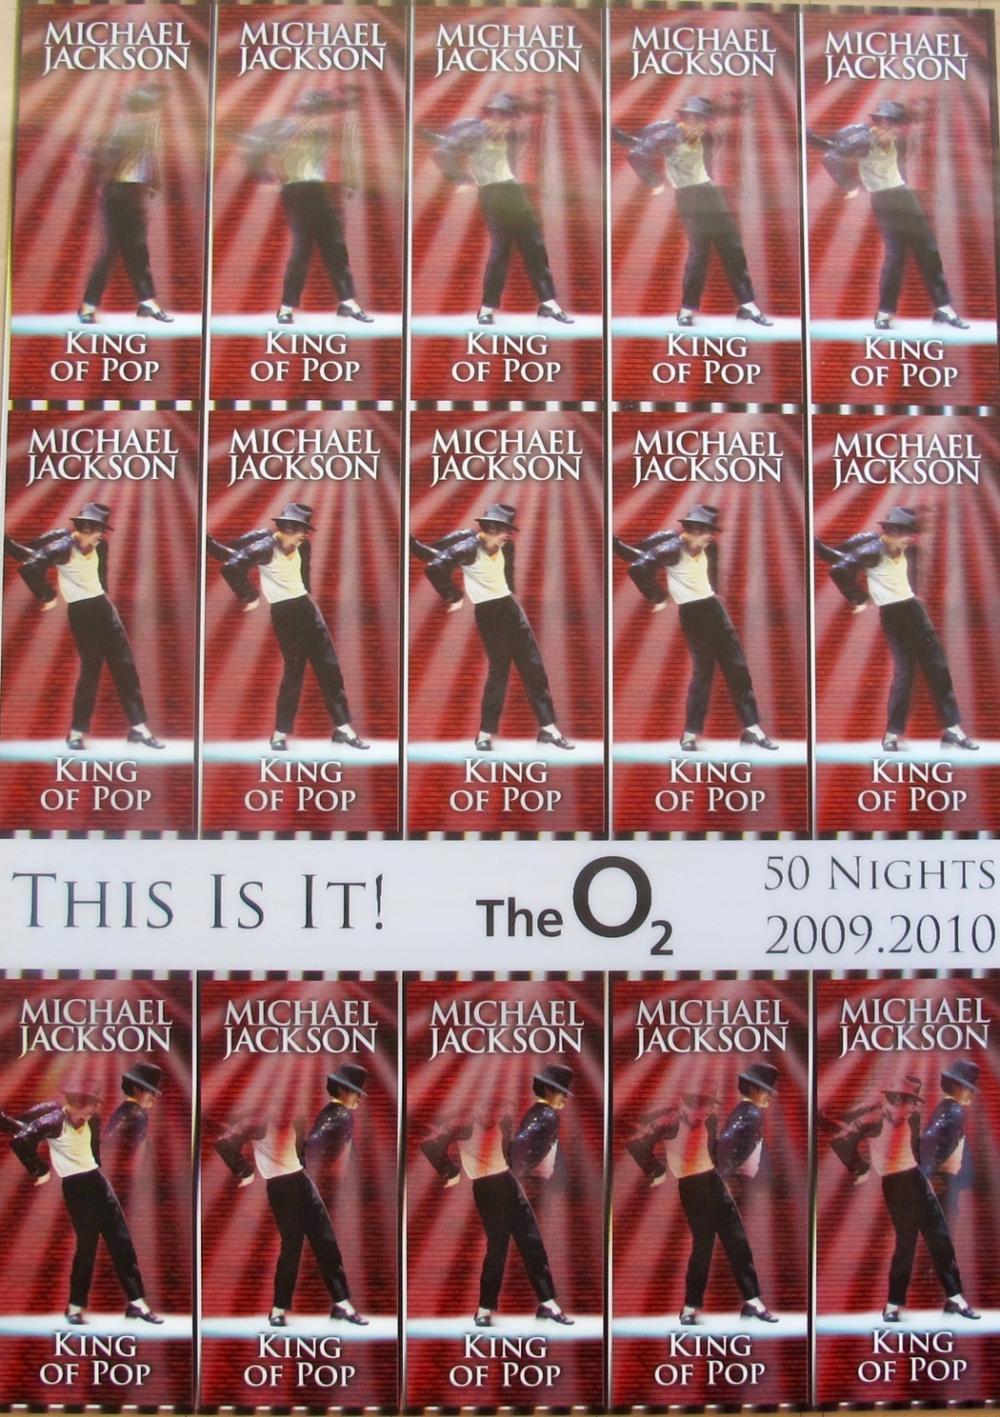 Michael Jackson This Is It Original Undistributed Hologram Aeg Concert Ticket Sheet #1